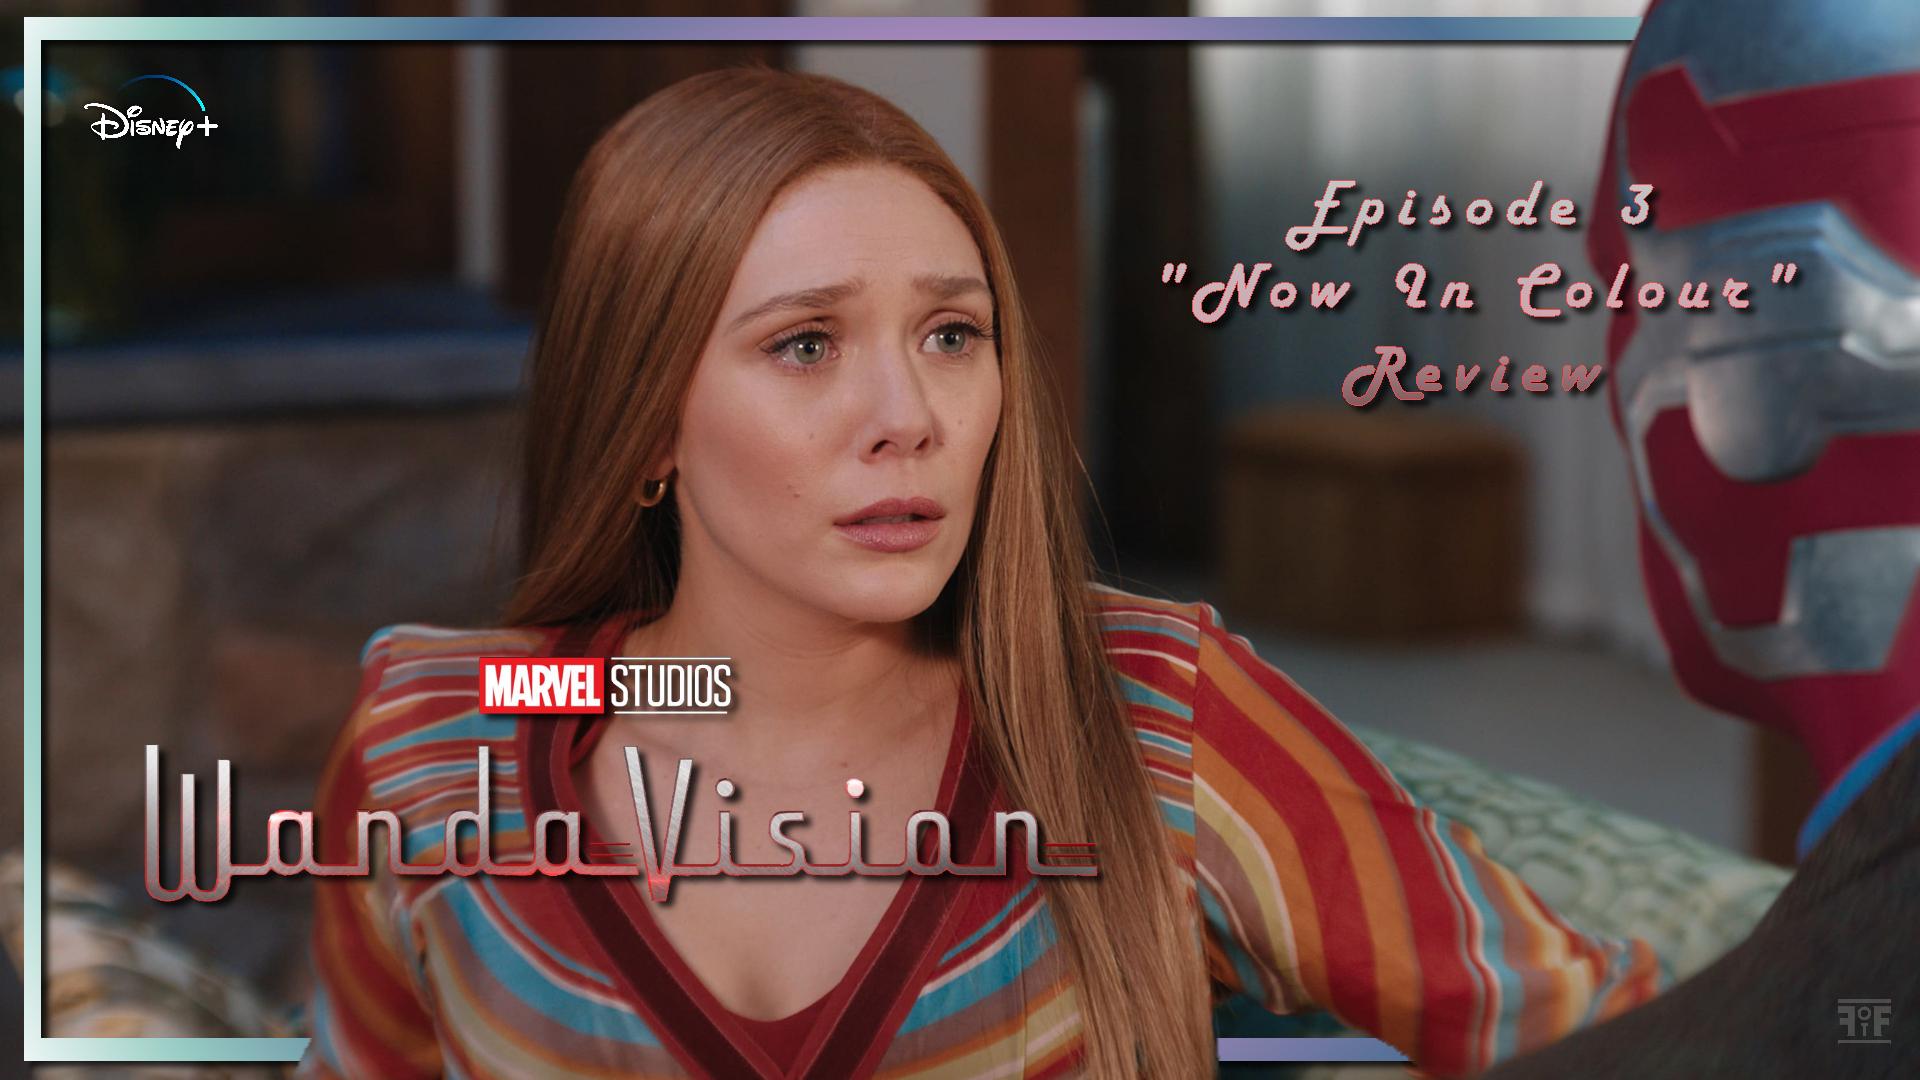 WandaVision (Episode 3) 'Now In Colour'